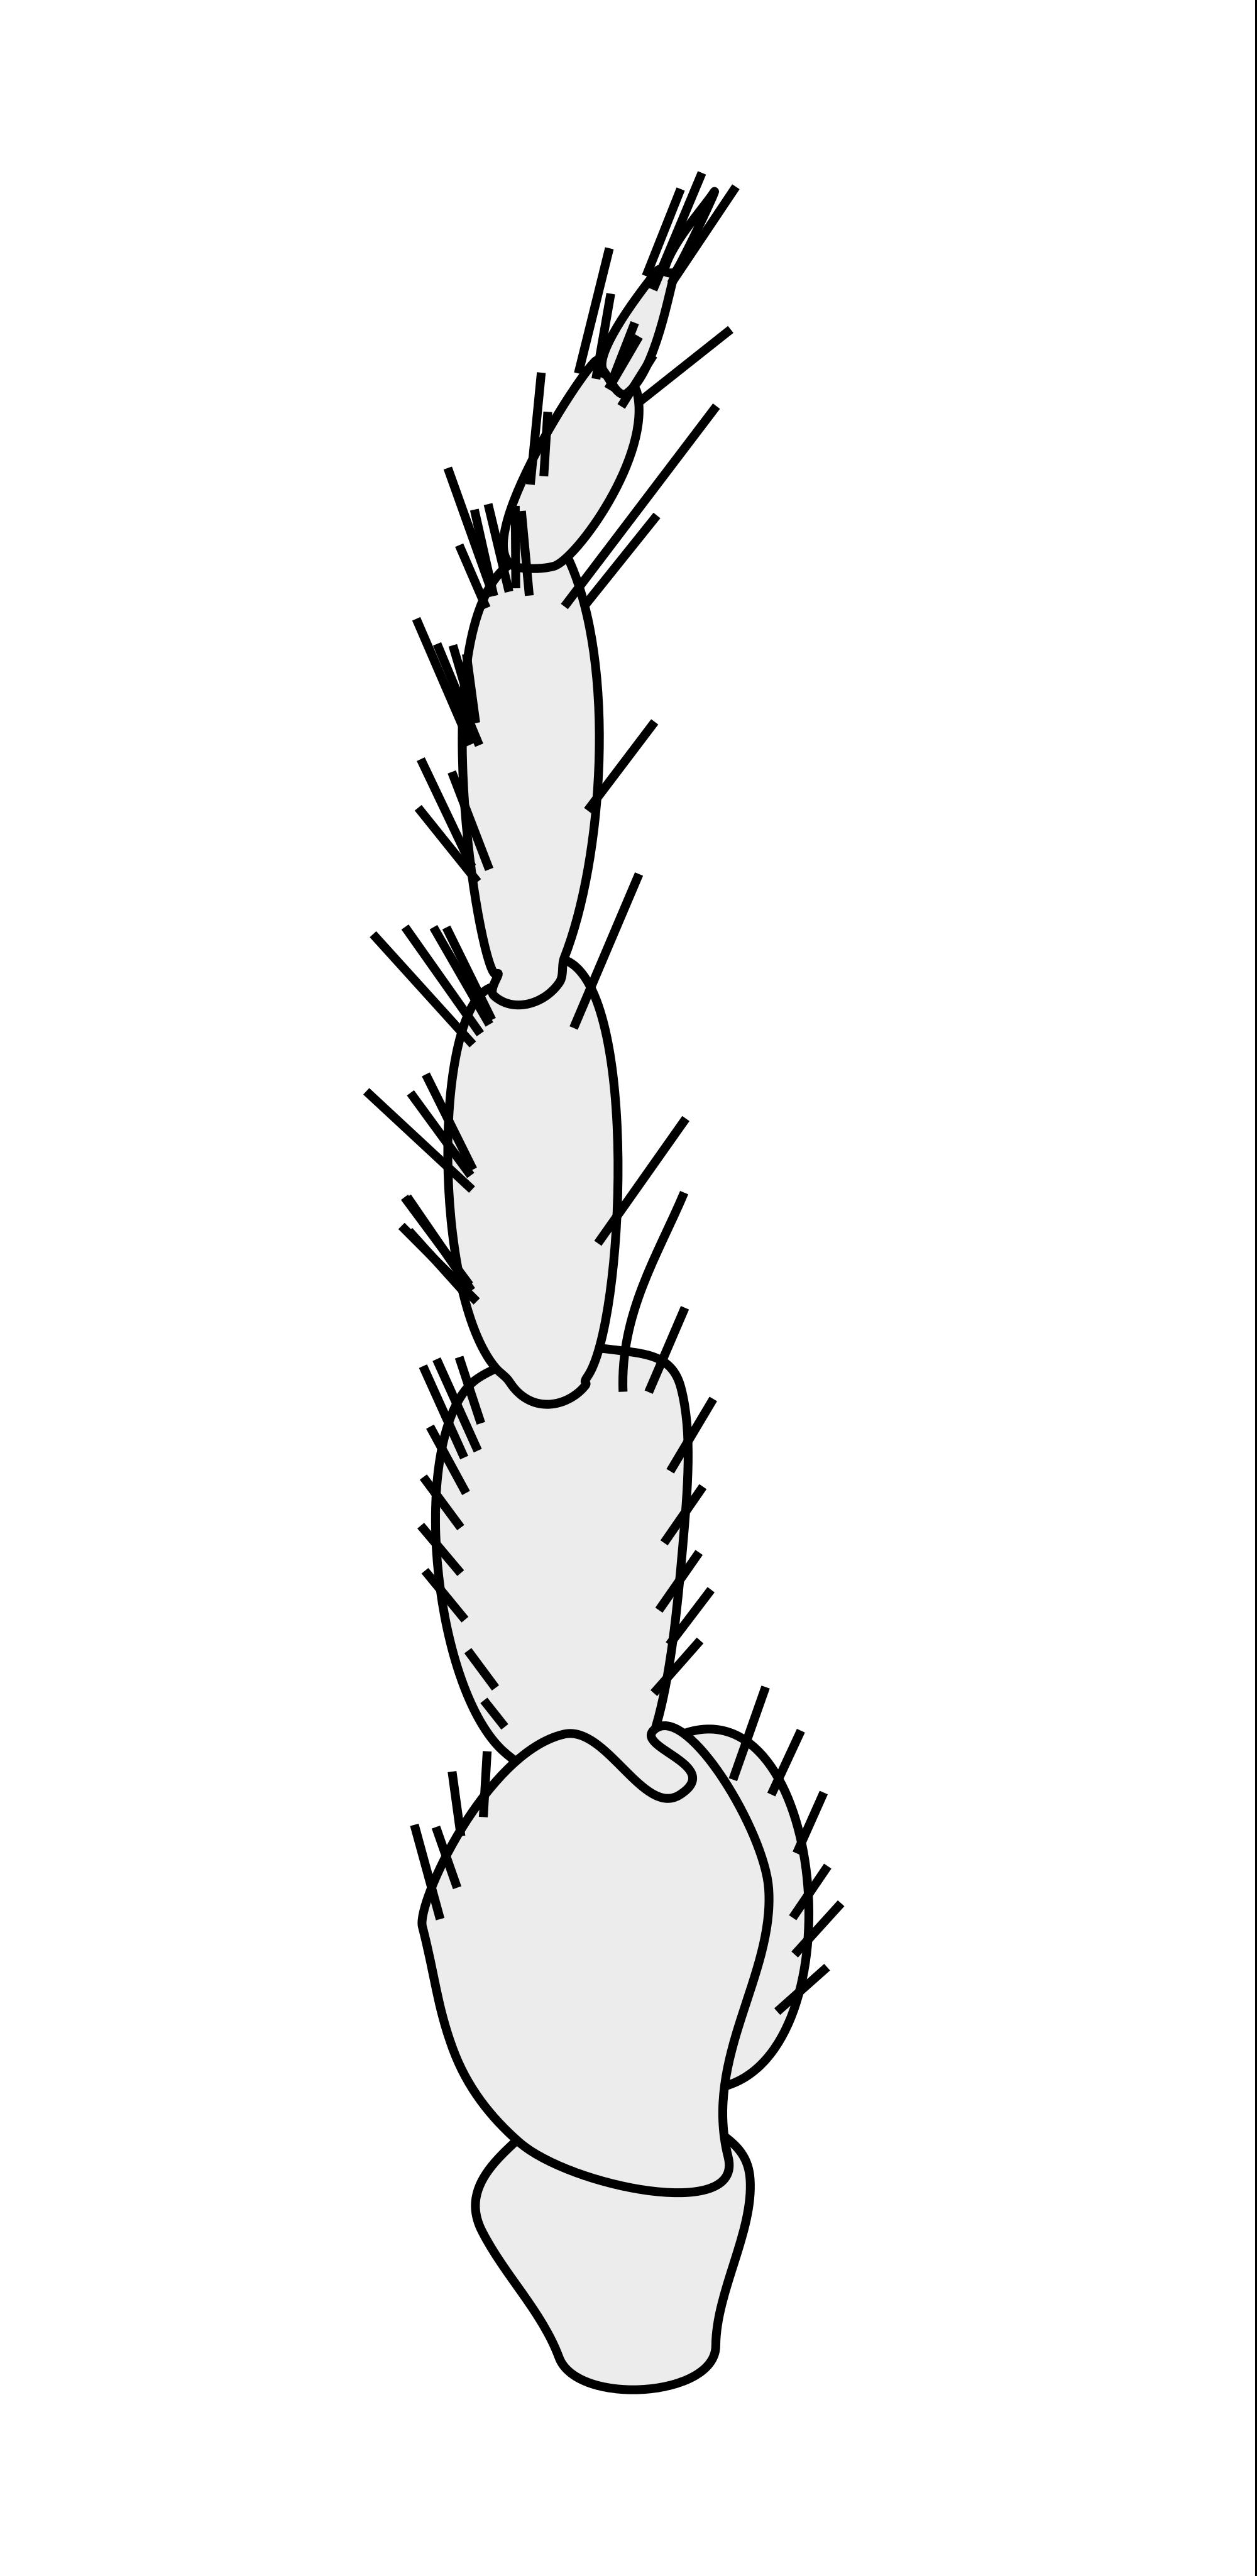 Crustacean svg #6, Download drawings